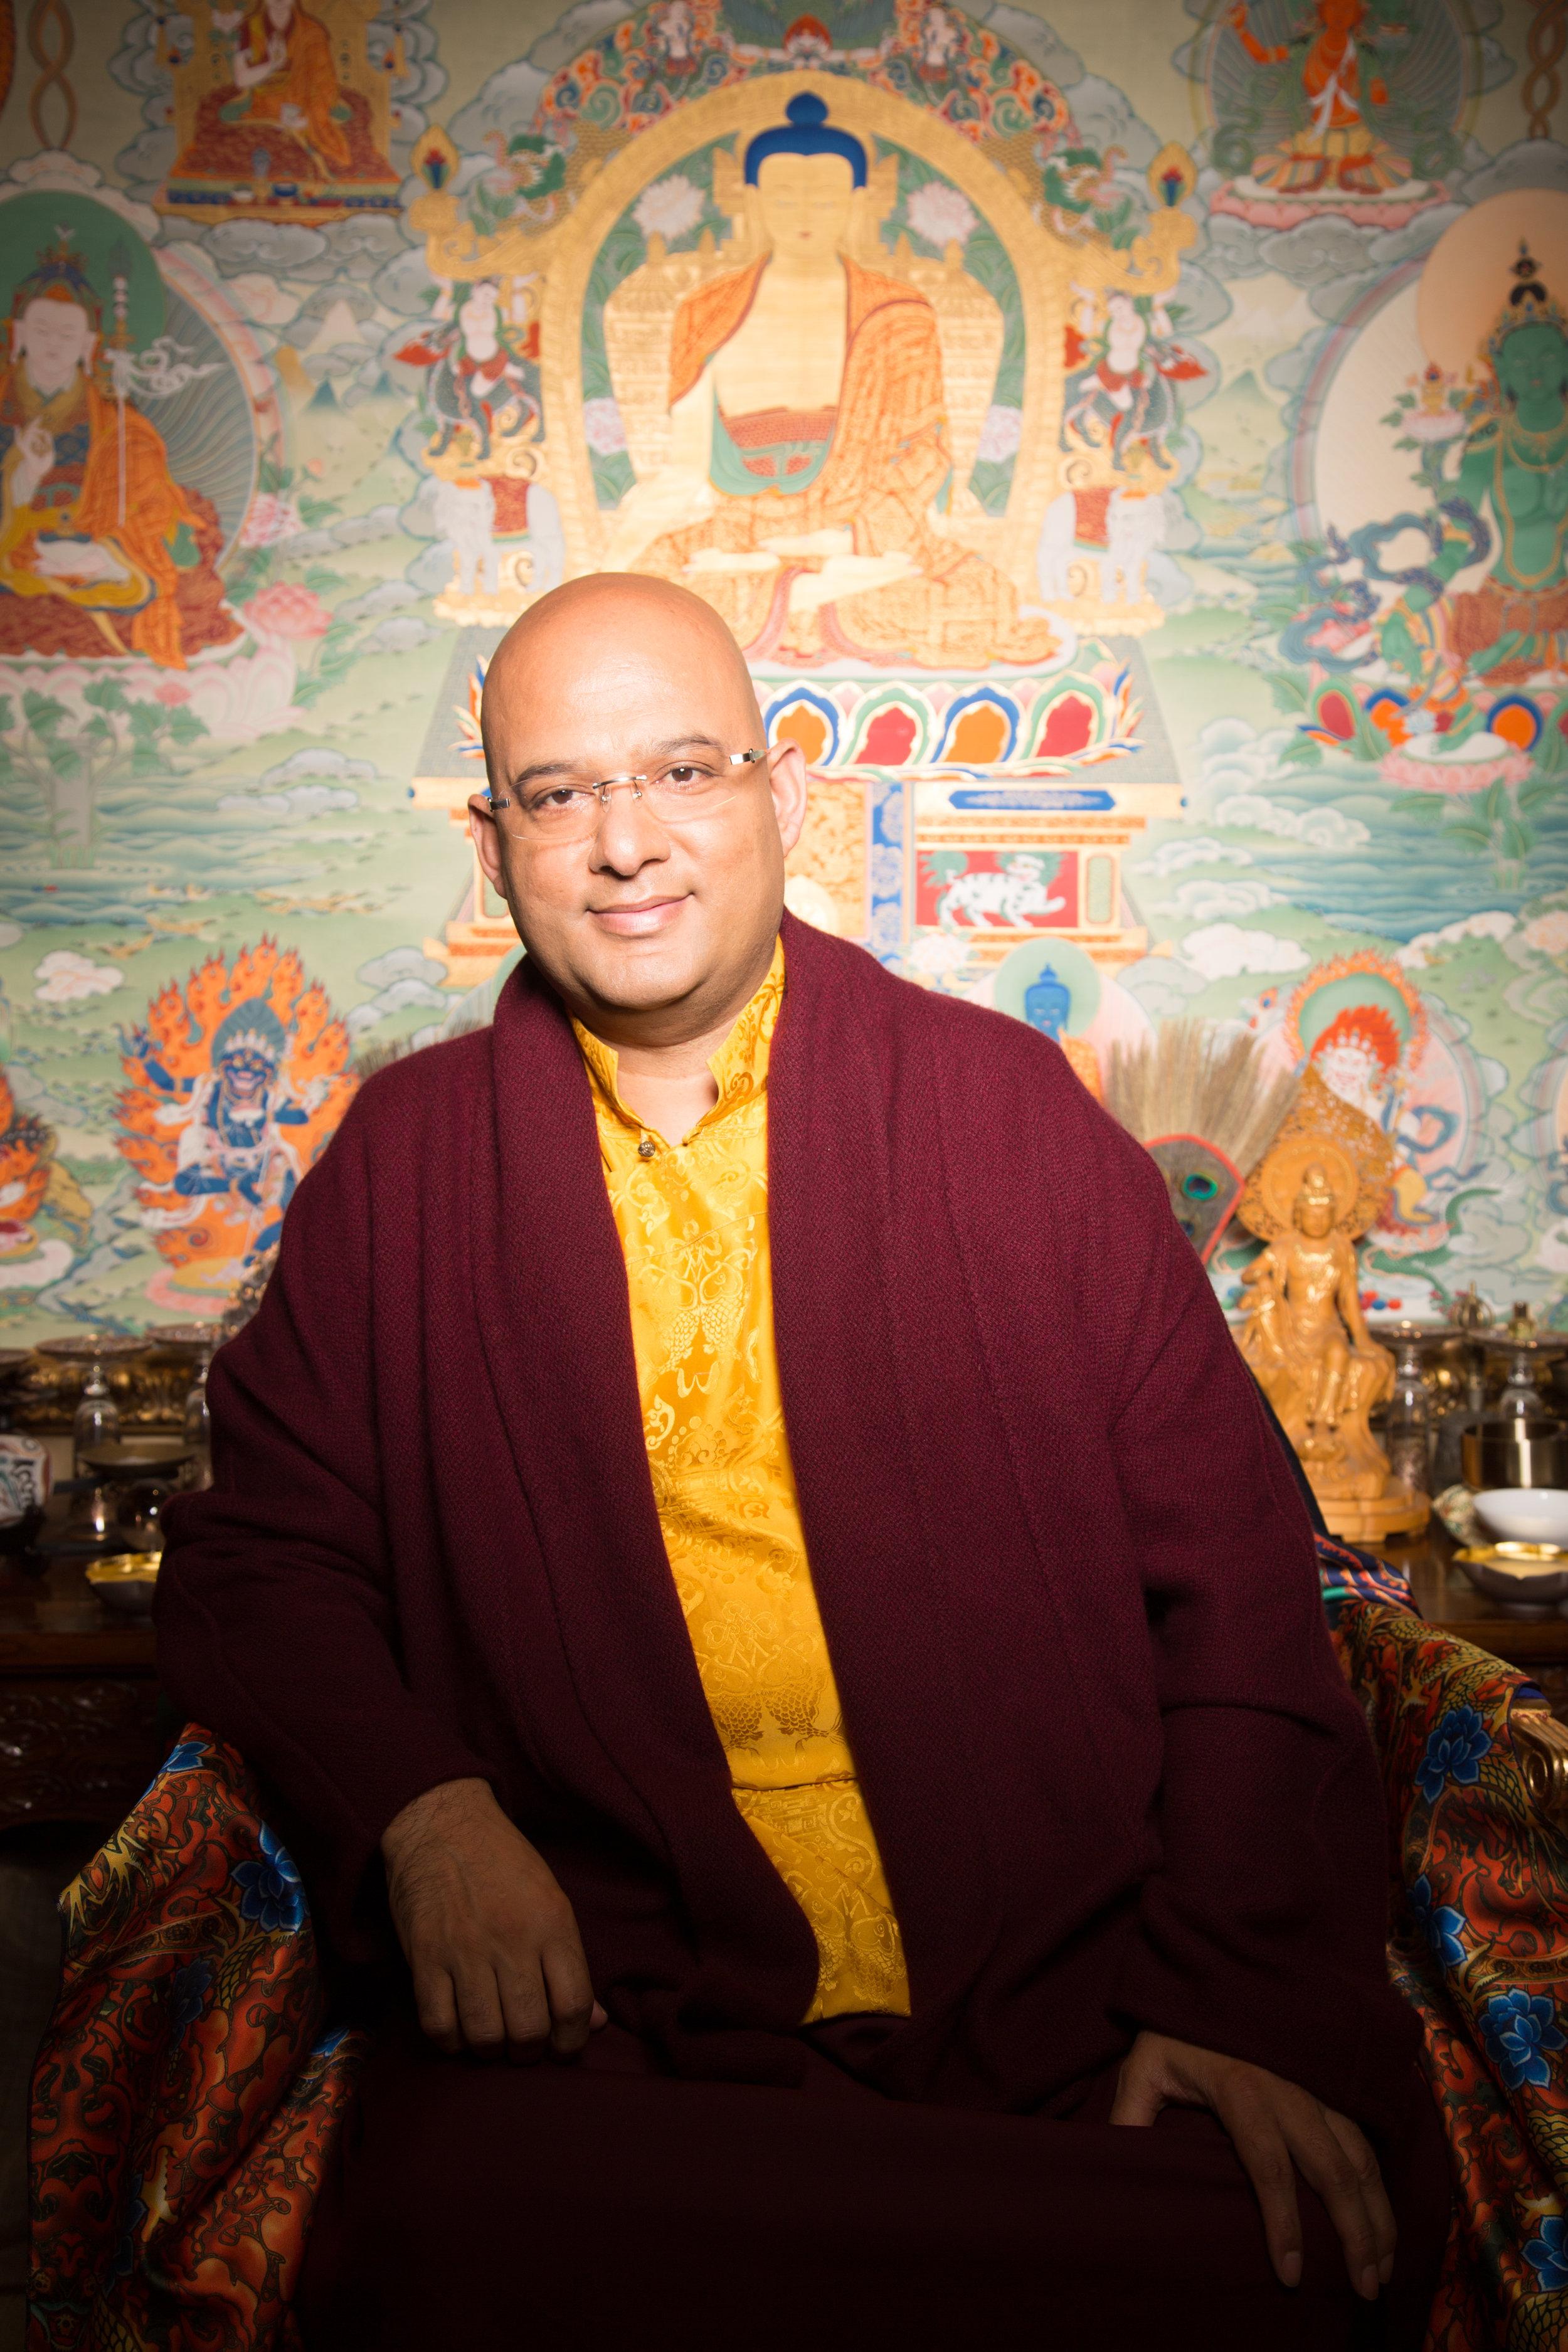 H.E. The 9th Kyabje Drukpa Choegon Rinpoche, Thutob Choekyi Wangchuk - the spiritual head of Dechen Choekhor and the supreme lineage holder of Drukpa Kargyu Lineage.